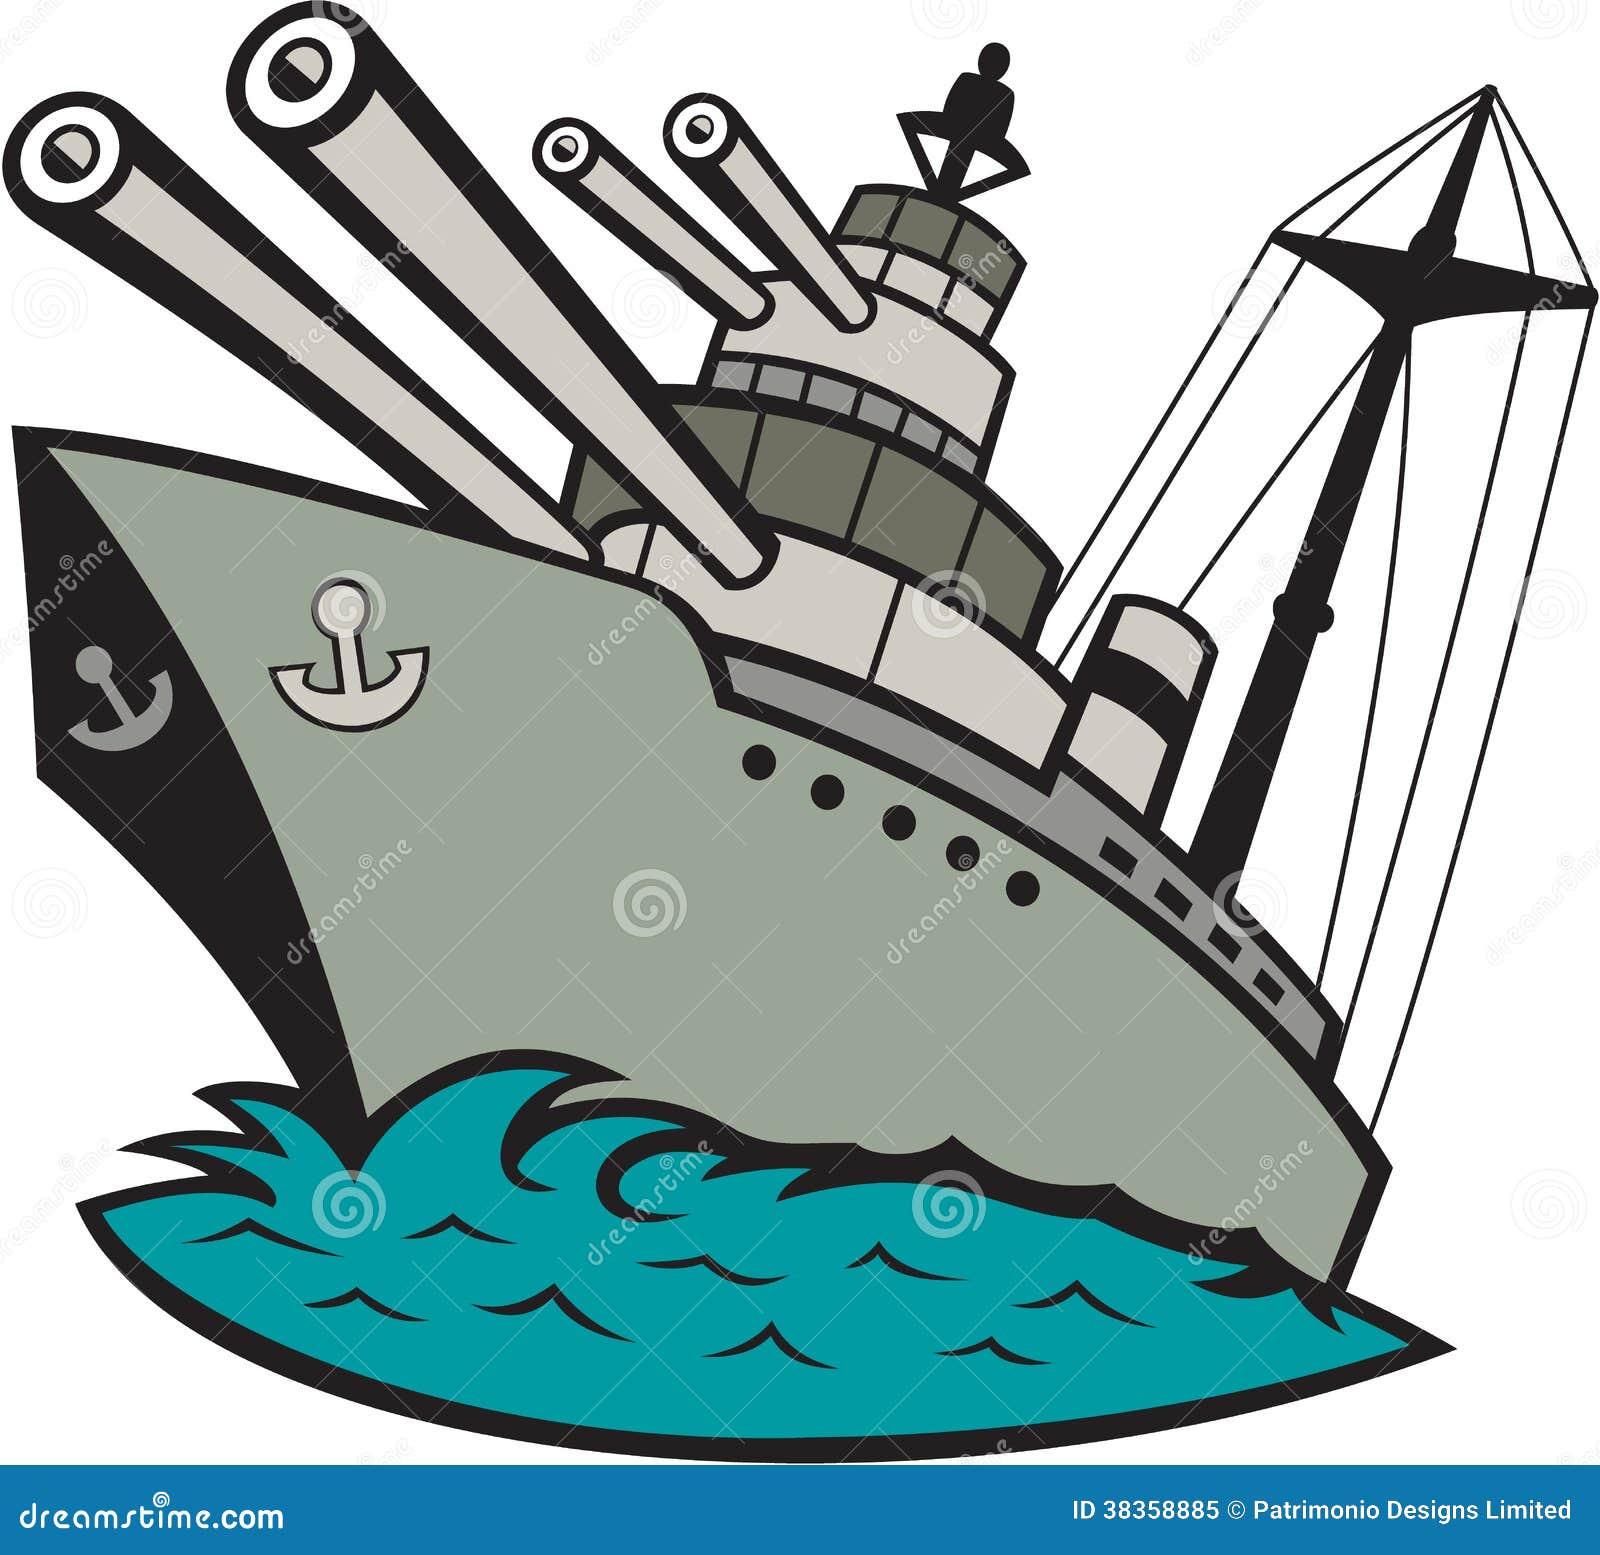 world war two battleship cartoon stock vector illustration of rh dreamstime com battleship clipart black and white battleship clipart free